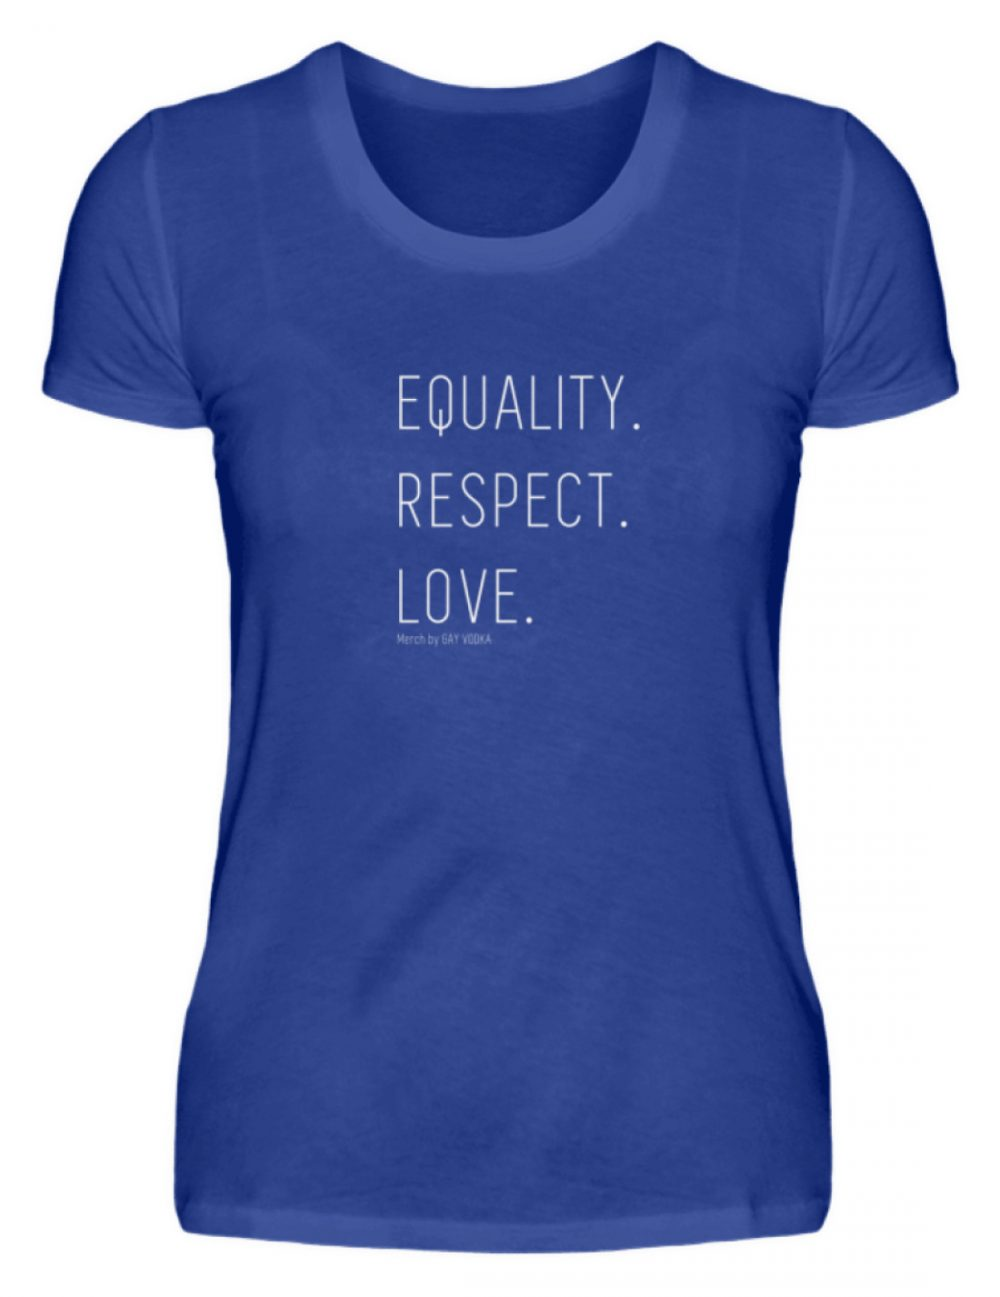 EQUALITY. RESPECT. LOVE. - Damen Premiumshirt-27